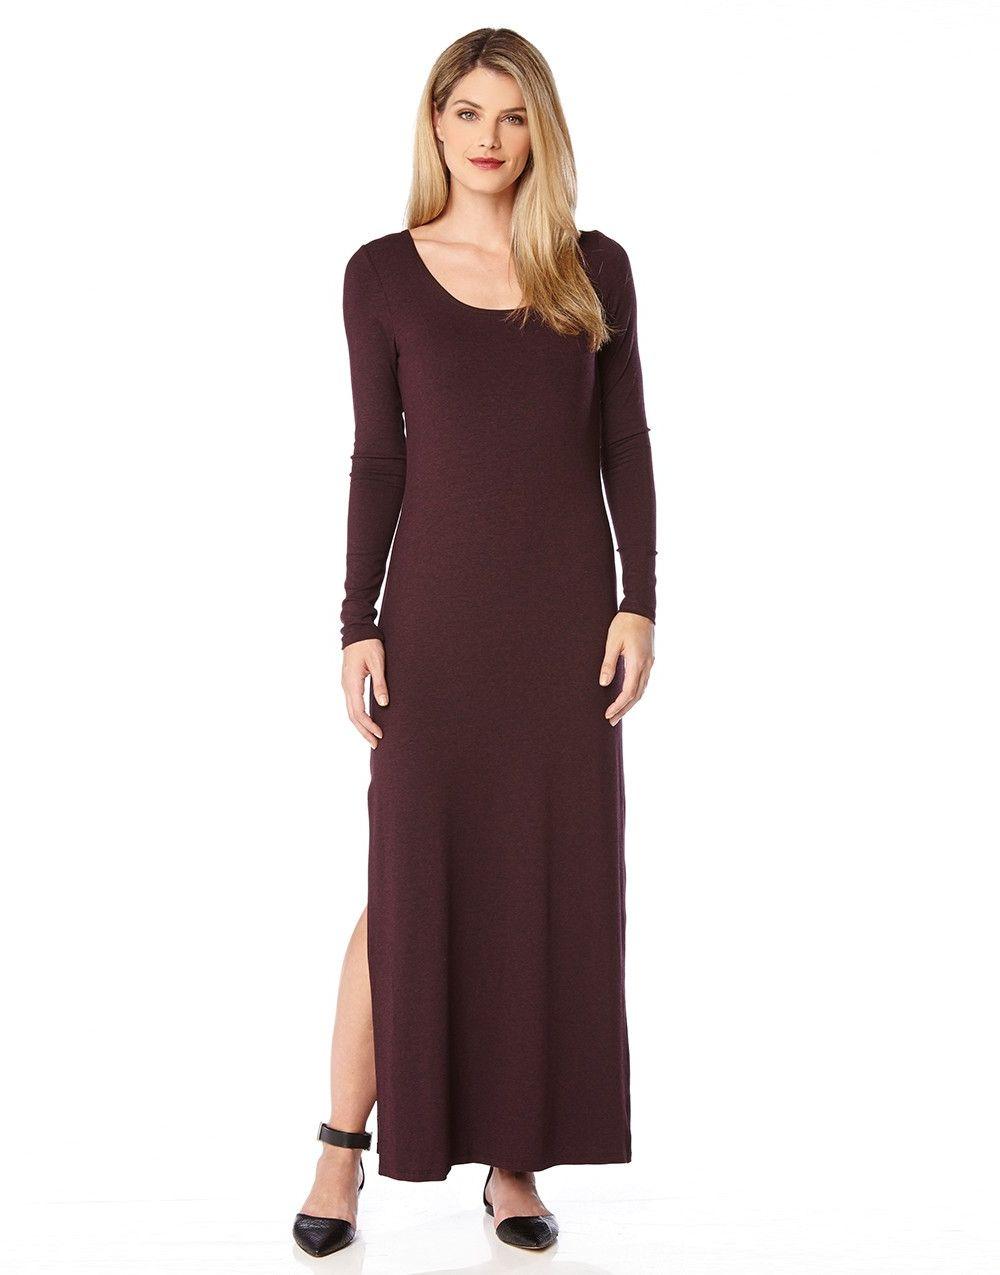 Long sleeve maxi dress knit longsleeve dress pinterest